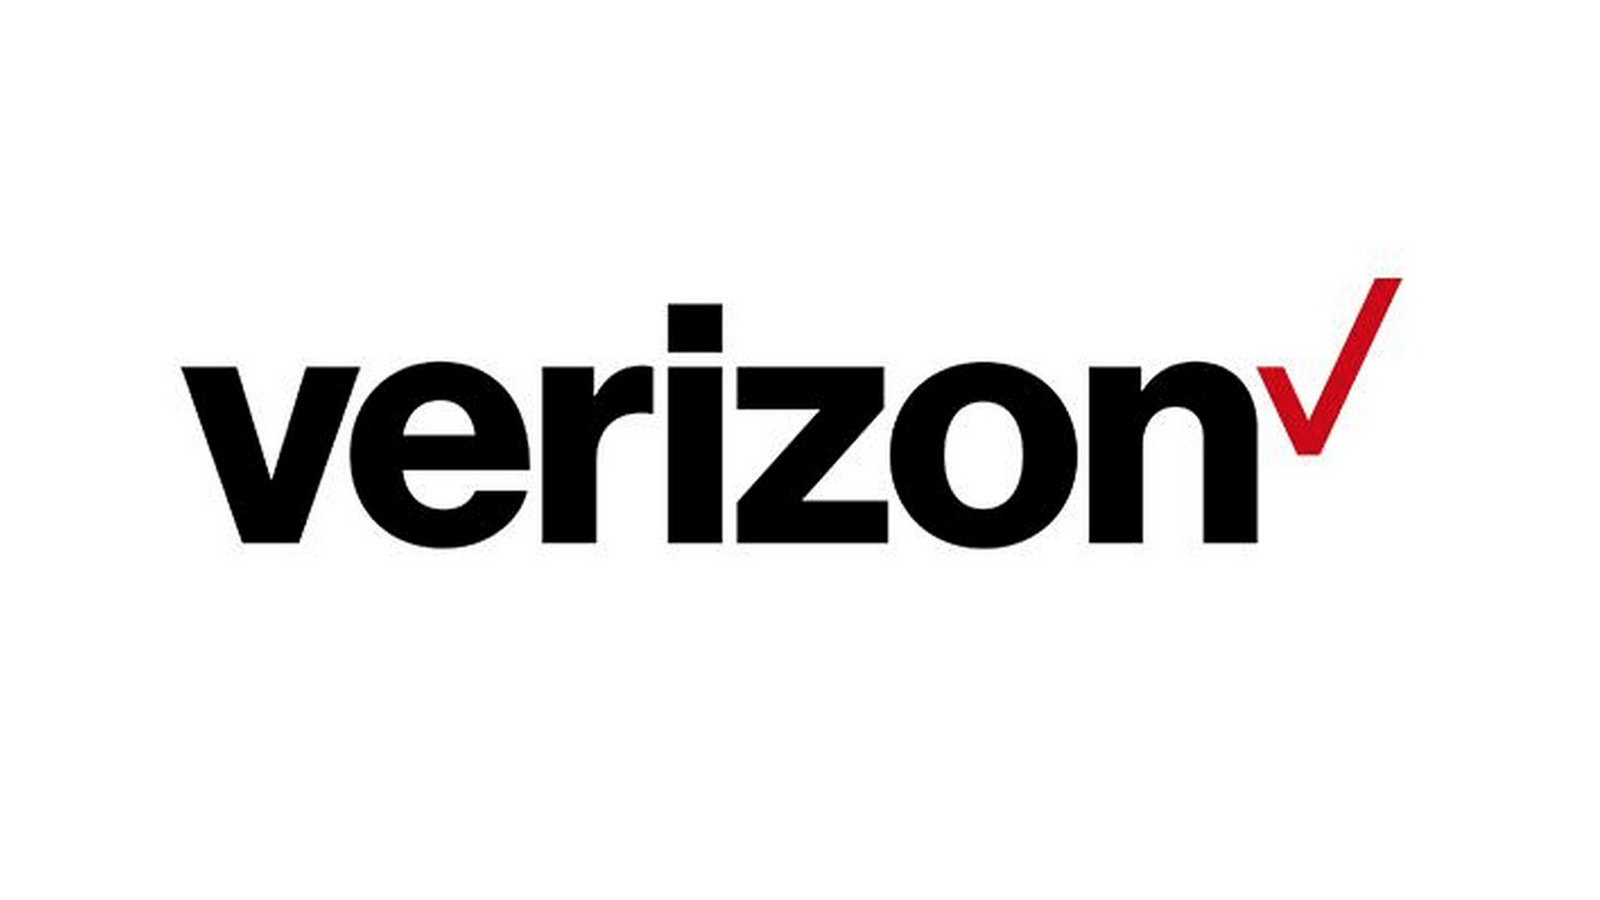 verizon just unveiled a new logo